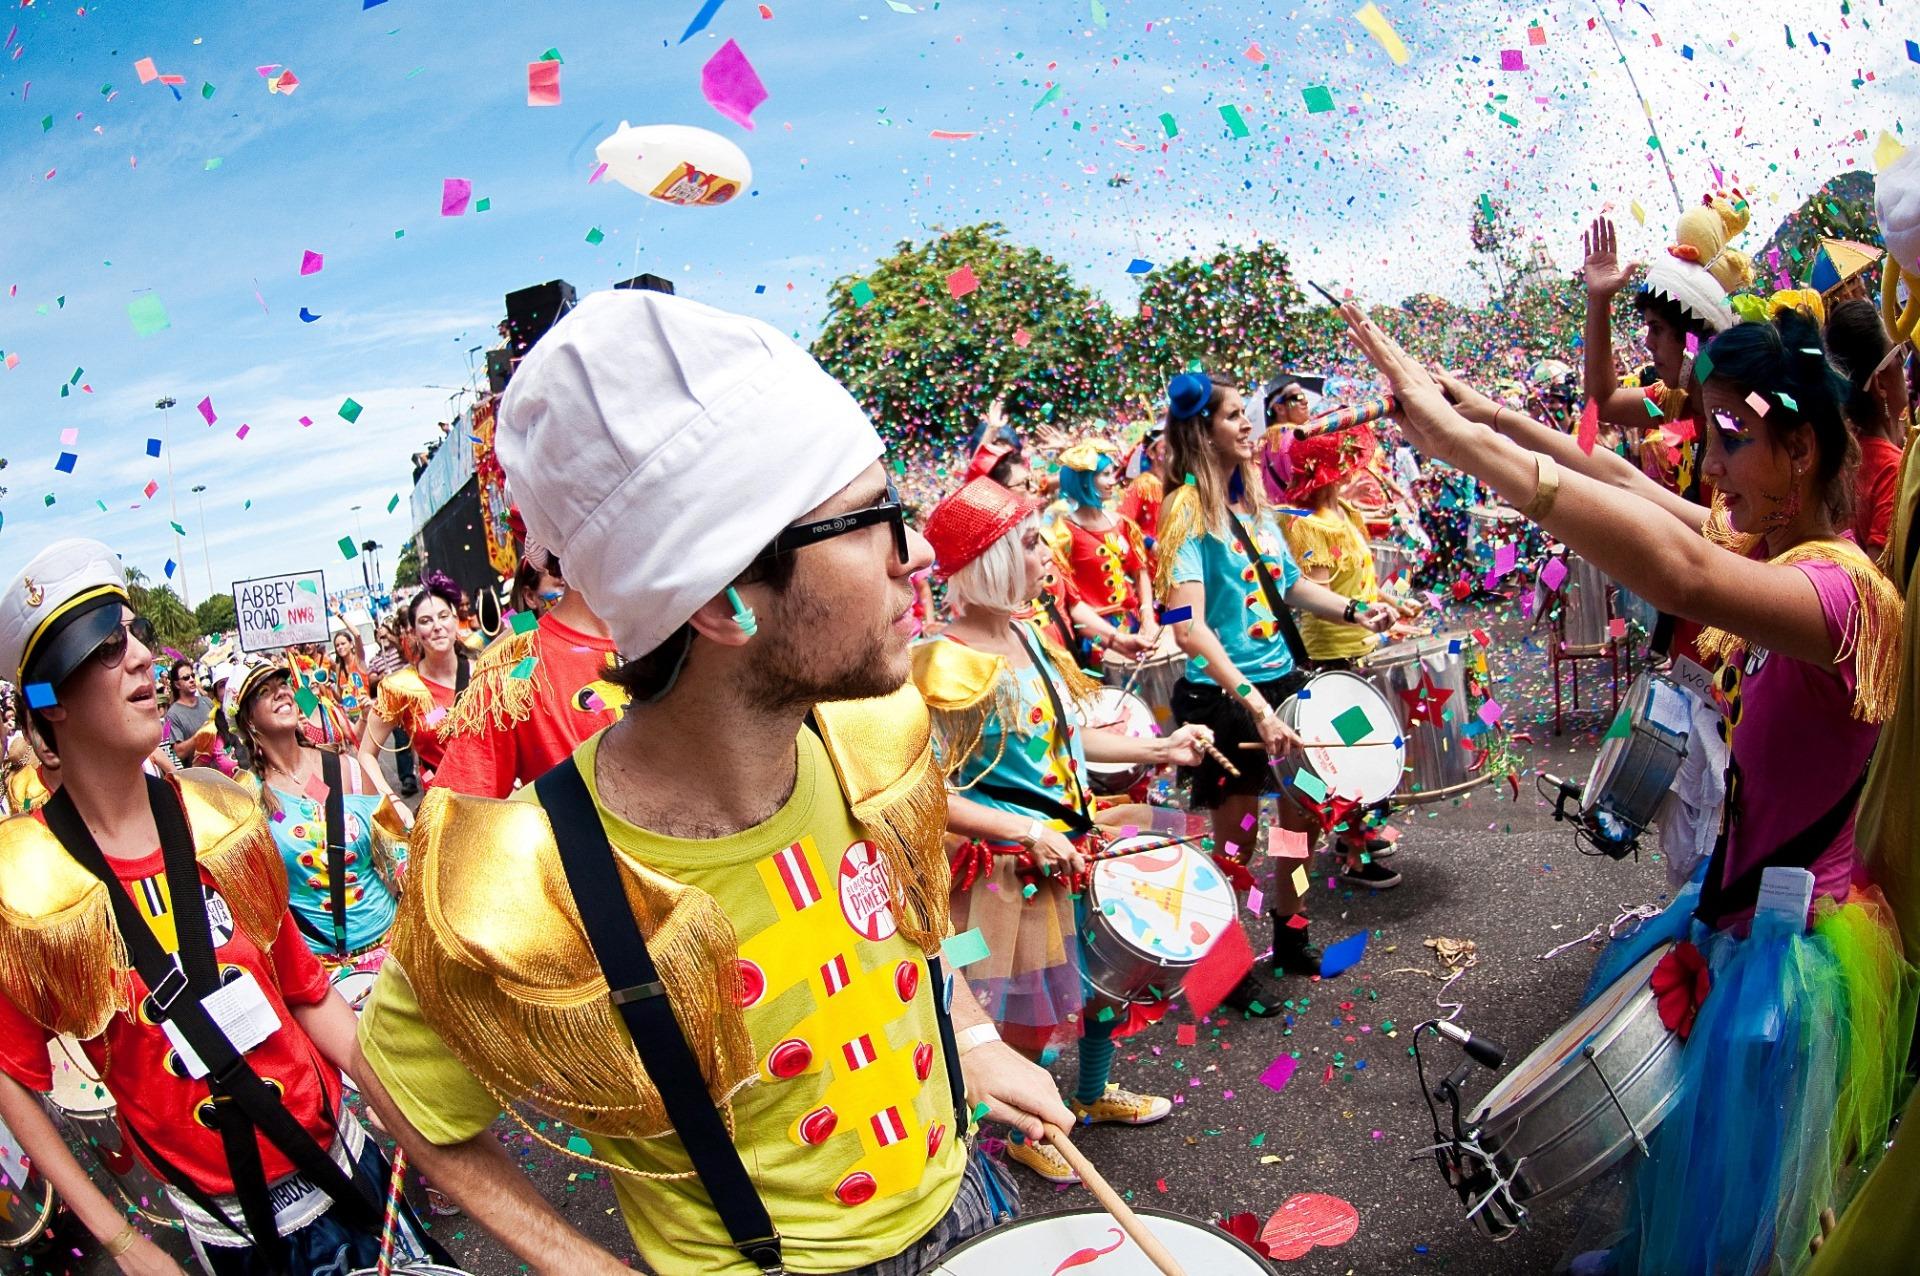 Como organizar retiro espiritual para o Carnaval?